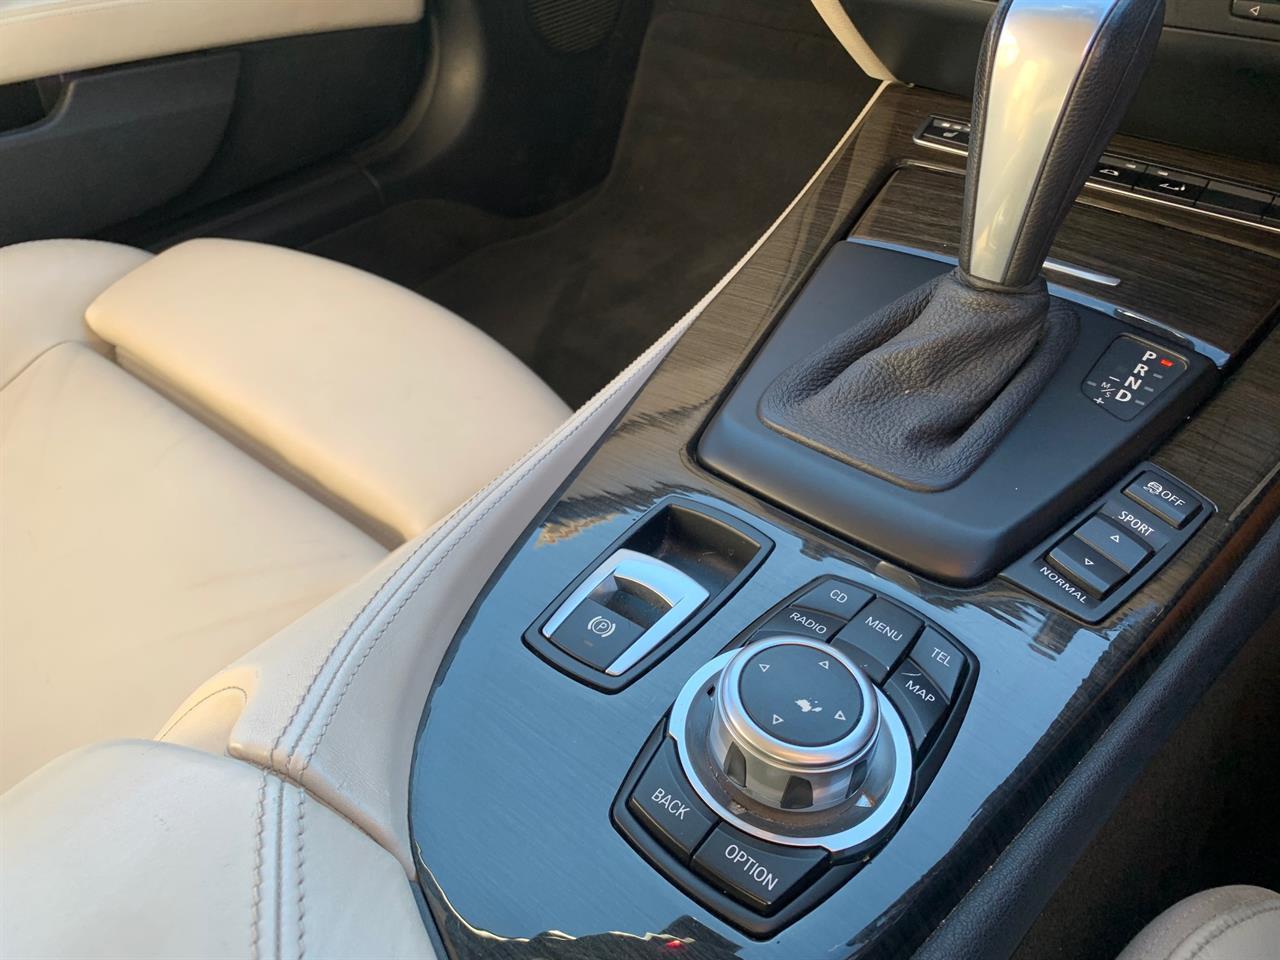 image-9, 2009 BMW Z4 SDrive Hardtop New Shape Convertible at Christchurch